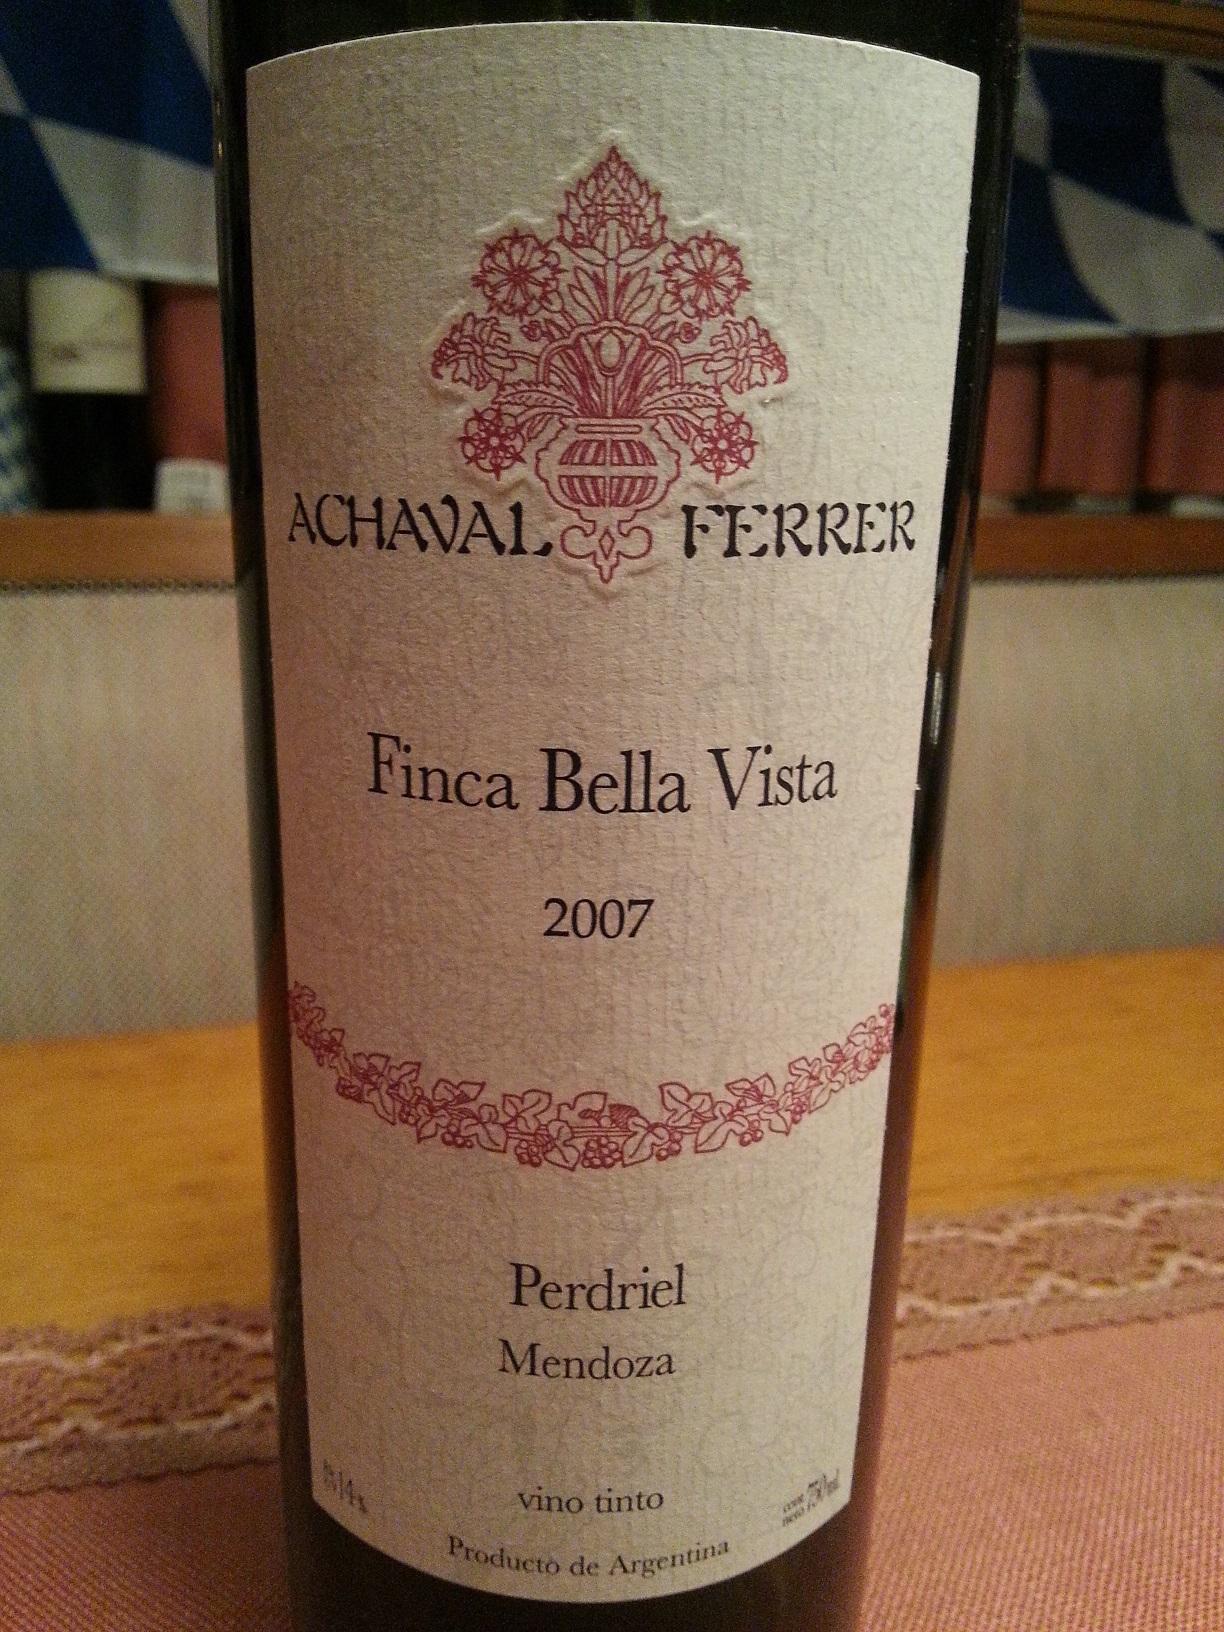 2007 Finca Bella Vista | Achaval Ferrer